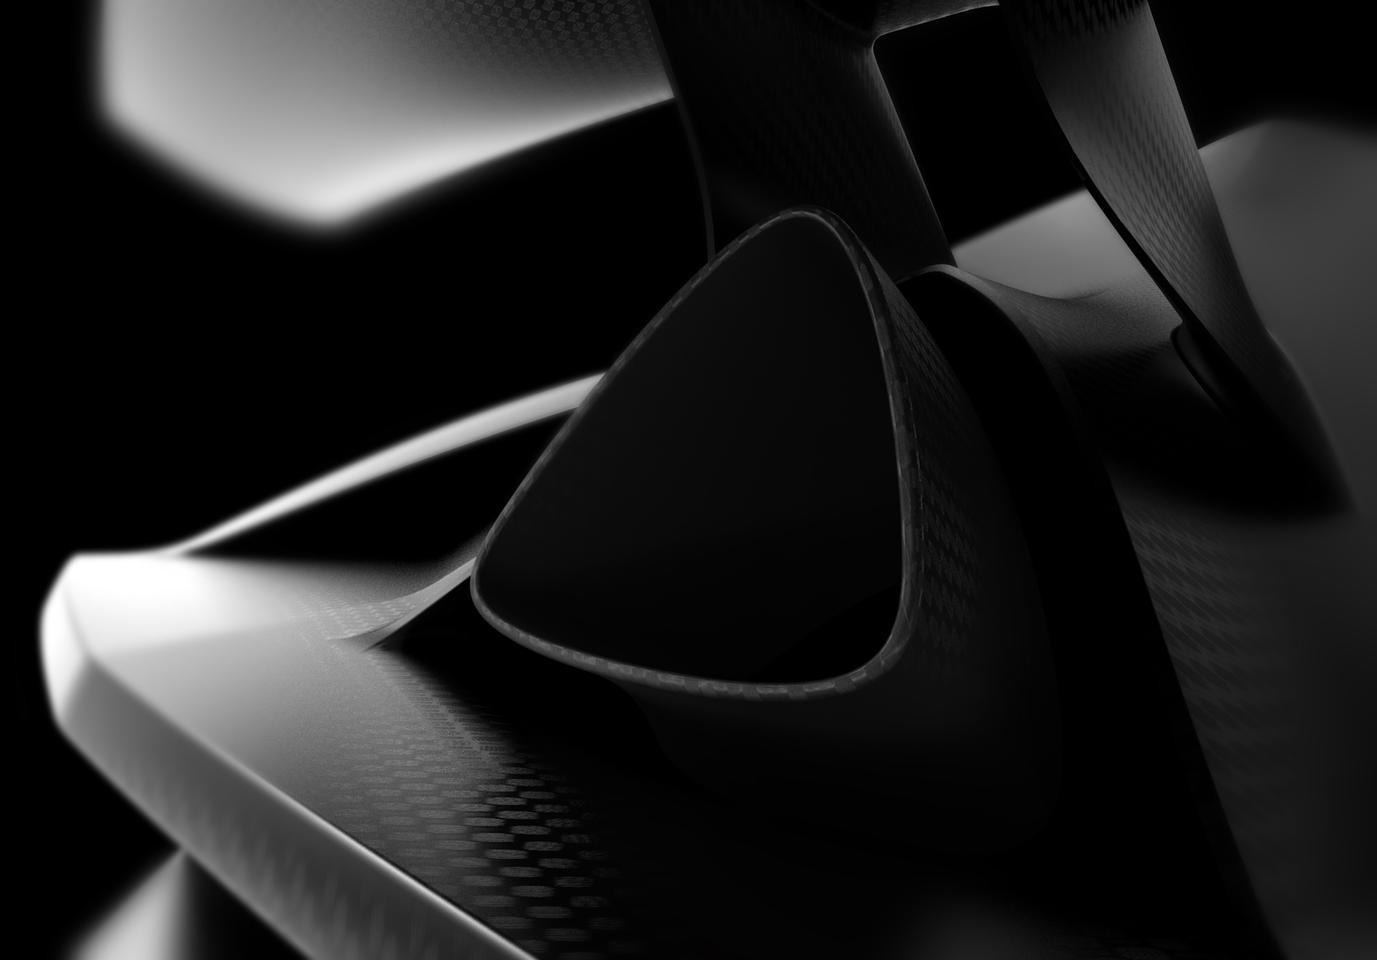 Carbon-fiber abounds on the Lamborghini Sesto Elemento